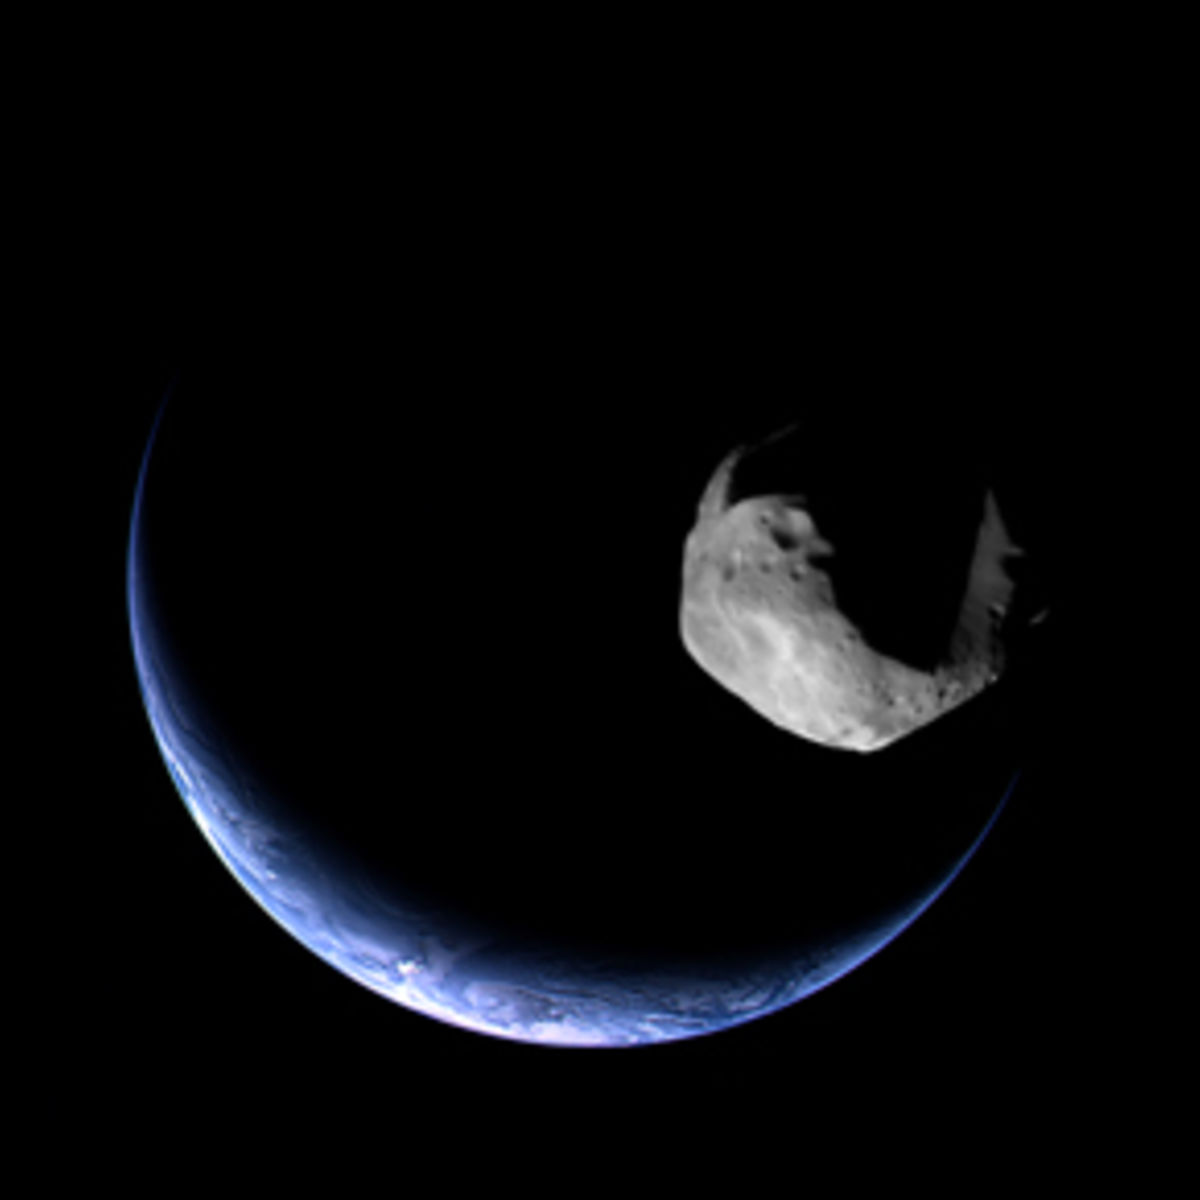 near_earth_asteroid_icon_4.jpg